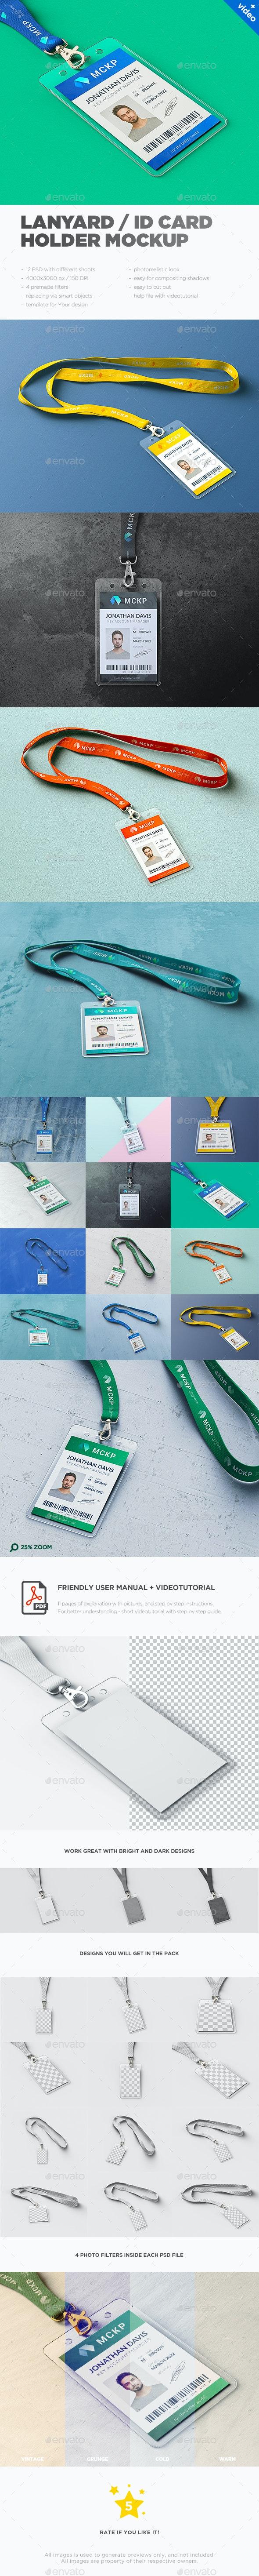 Lanyard / ID Card Holder MockUp - Stationery Print